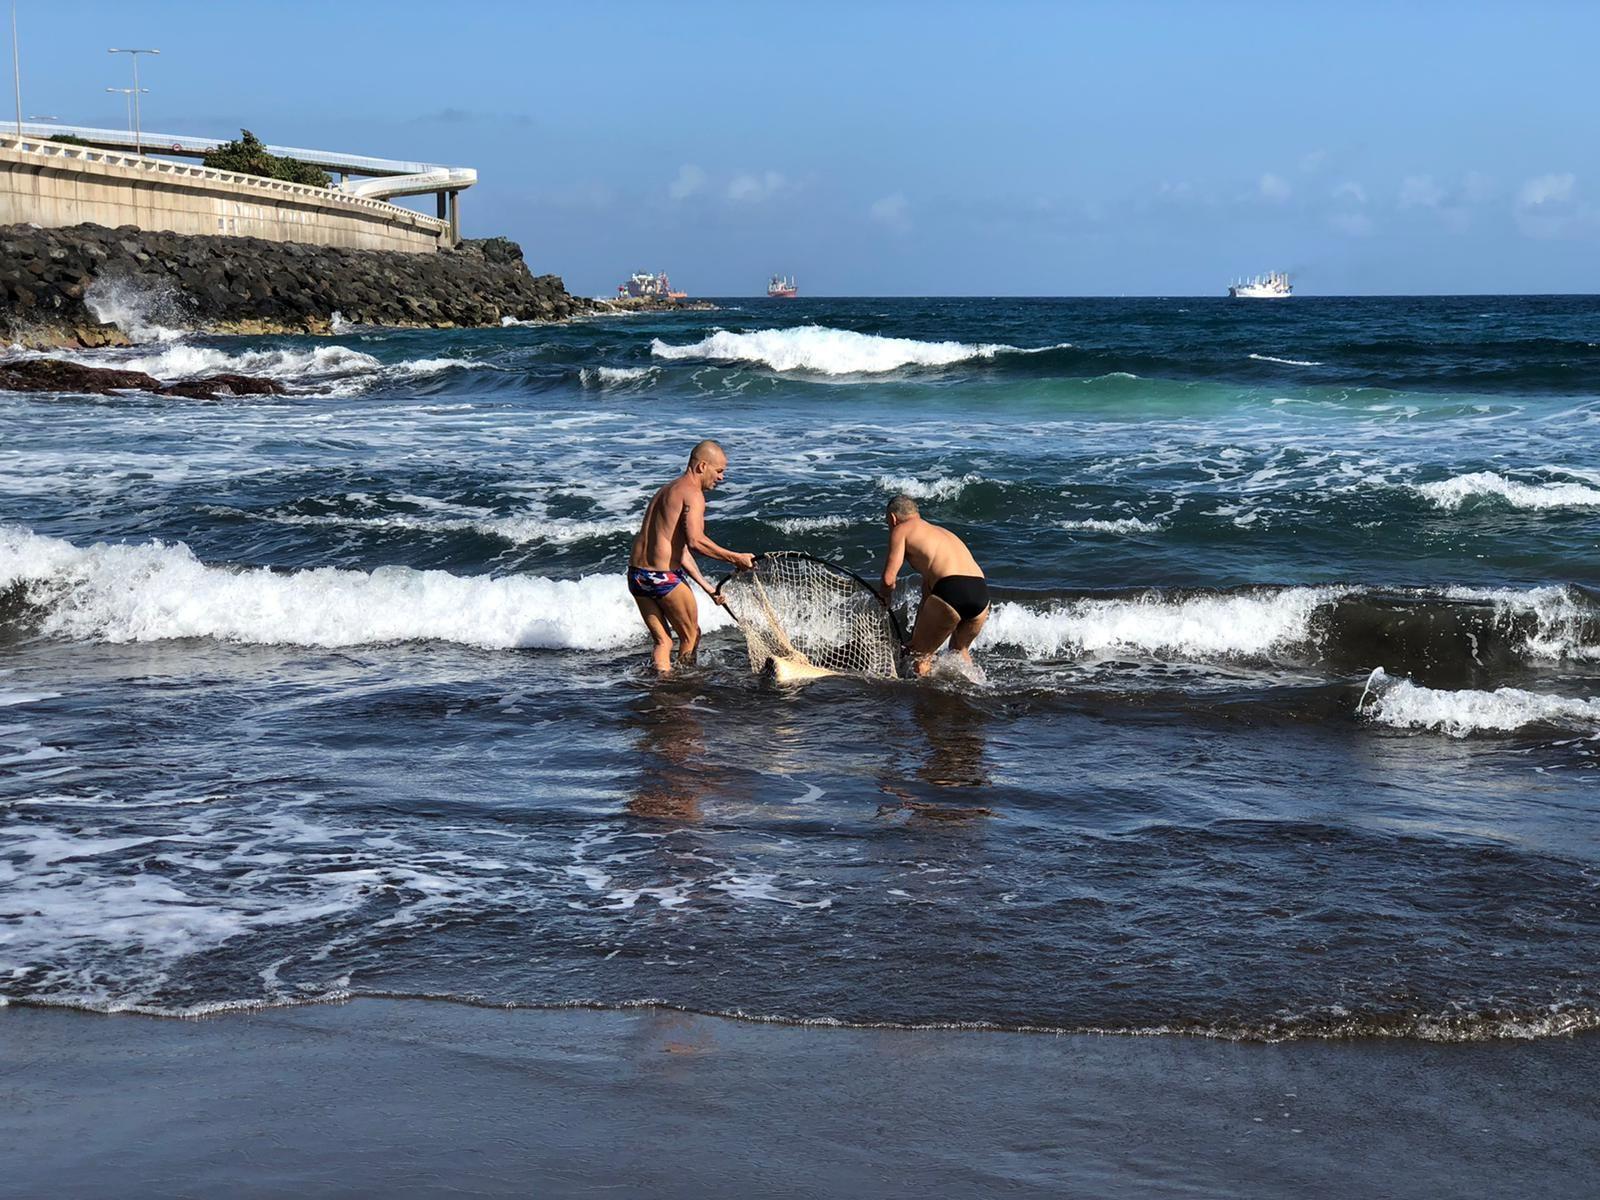 2 - Rescate mantelina piscinas La Laja noviembre 2020.jpg